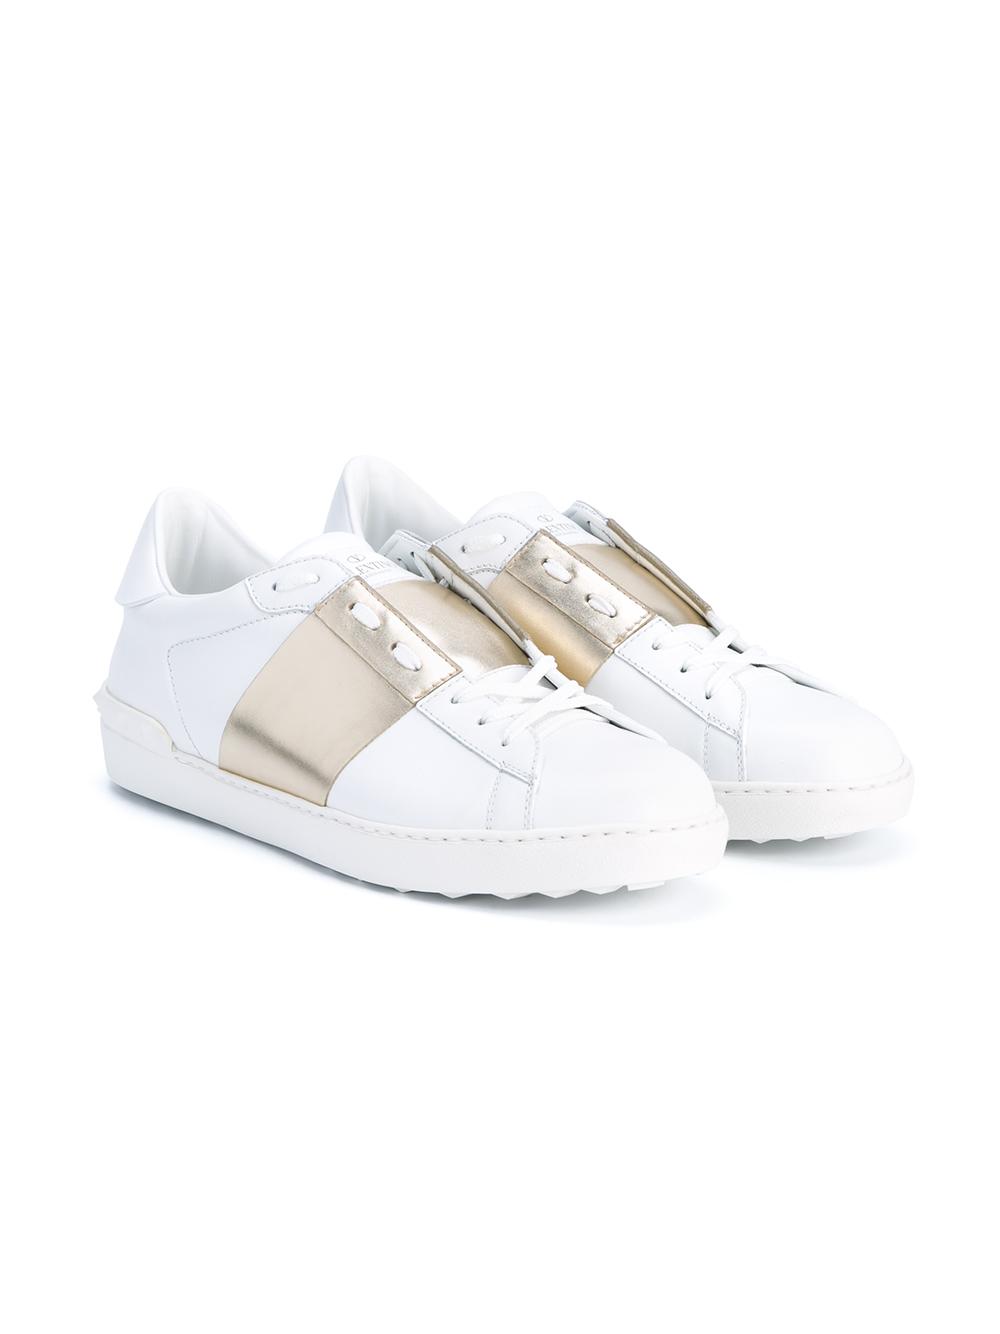 Valentino Sneakers White